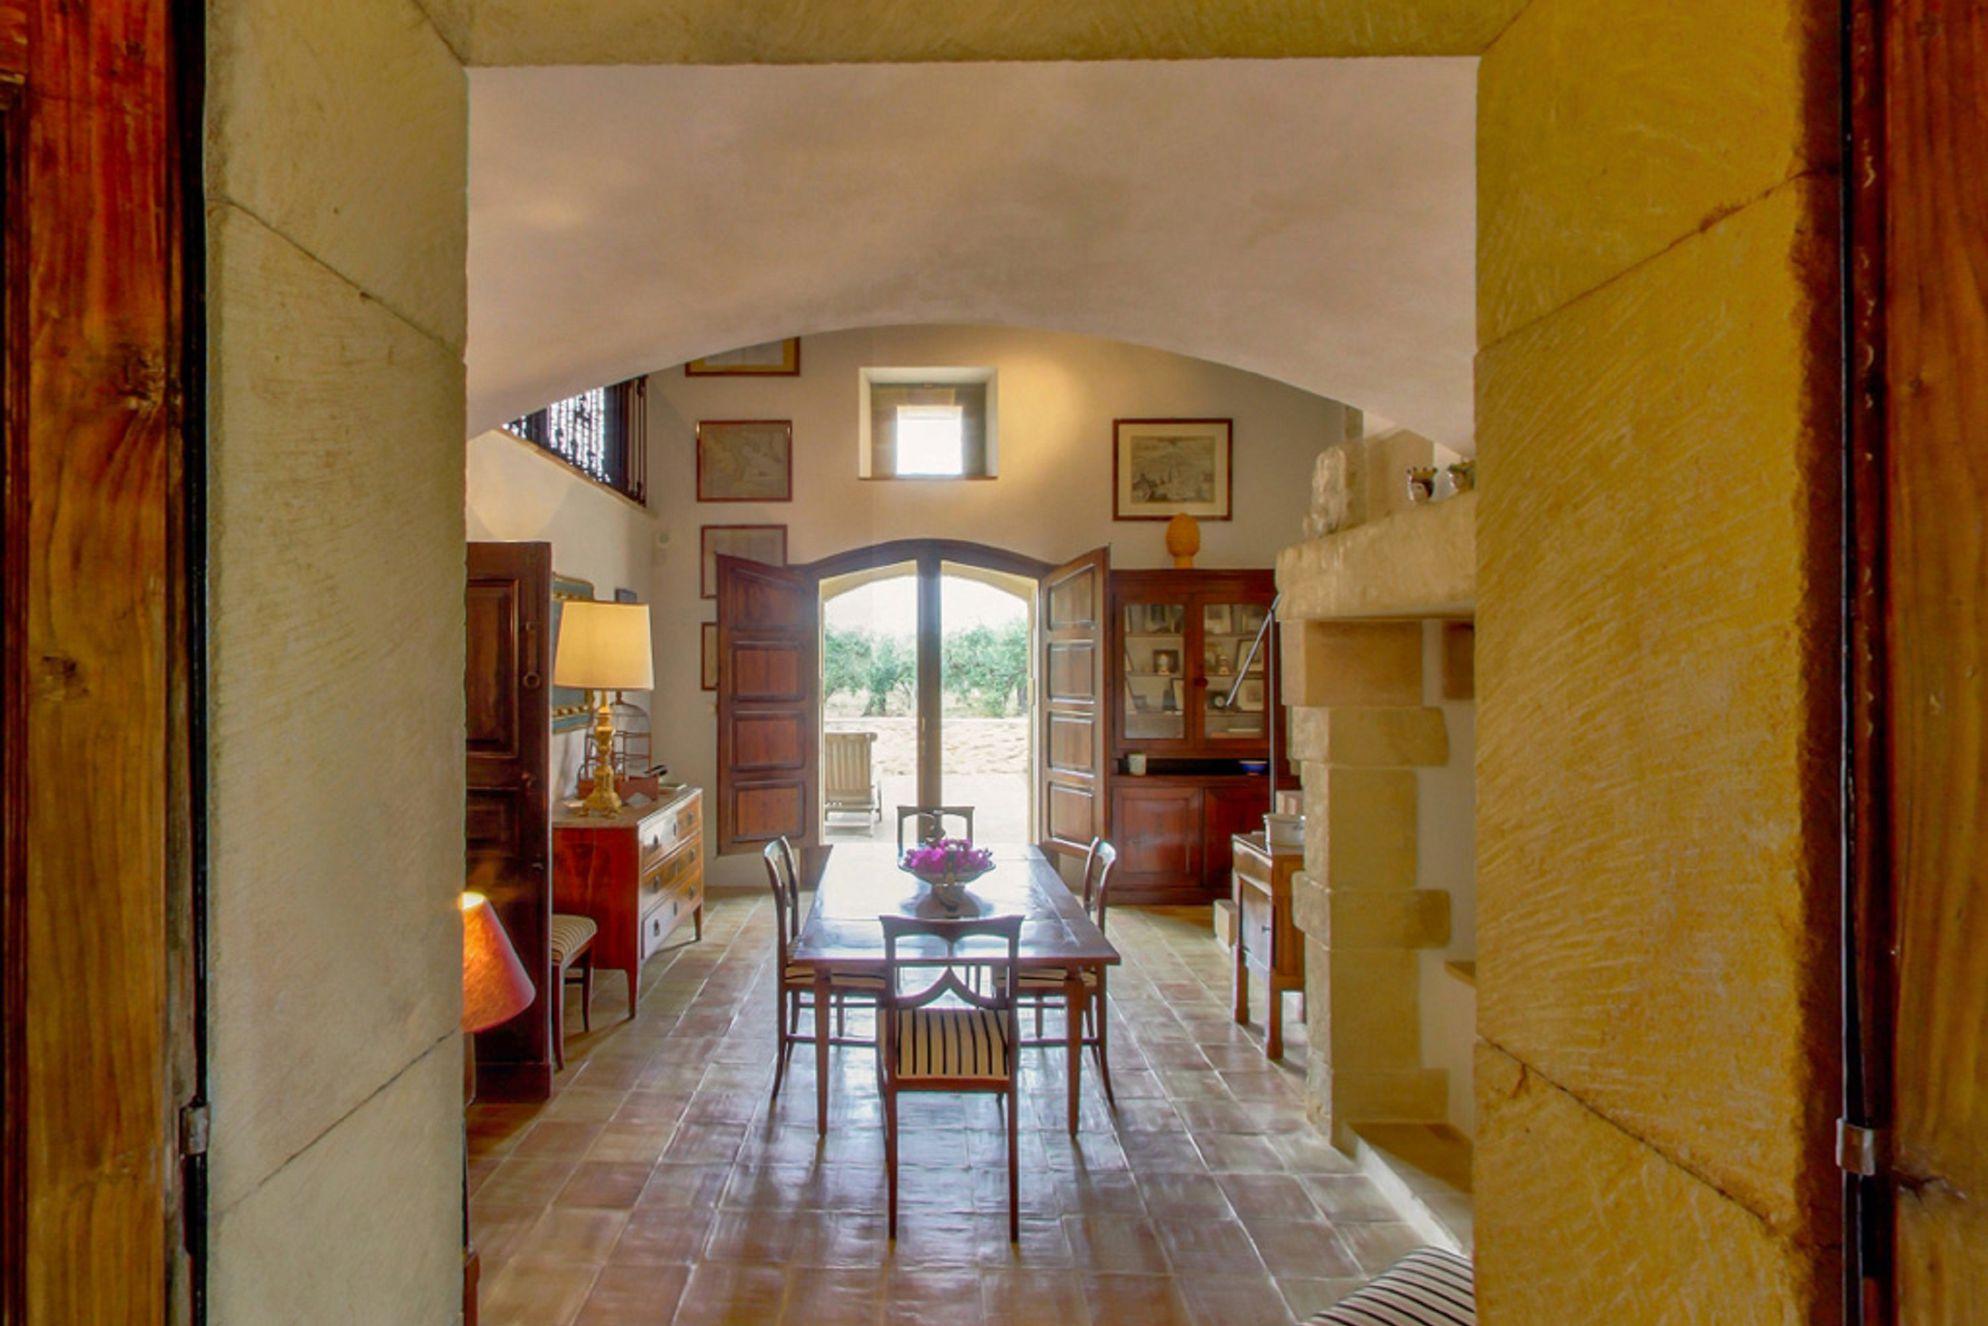 Baglio Villa Sicilia - Gallery